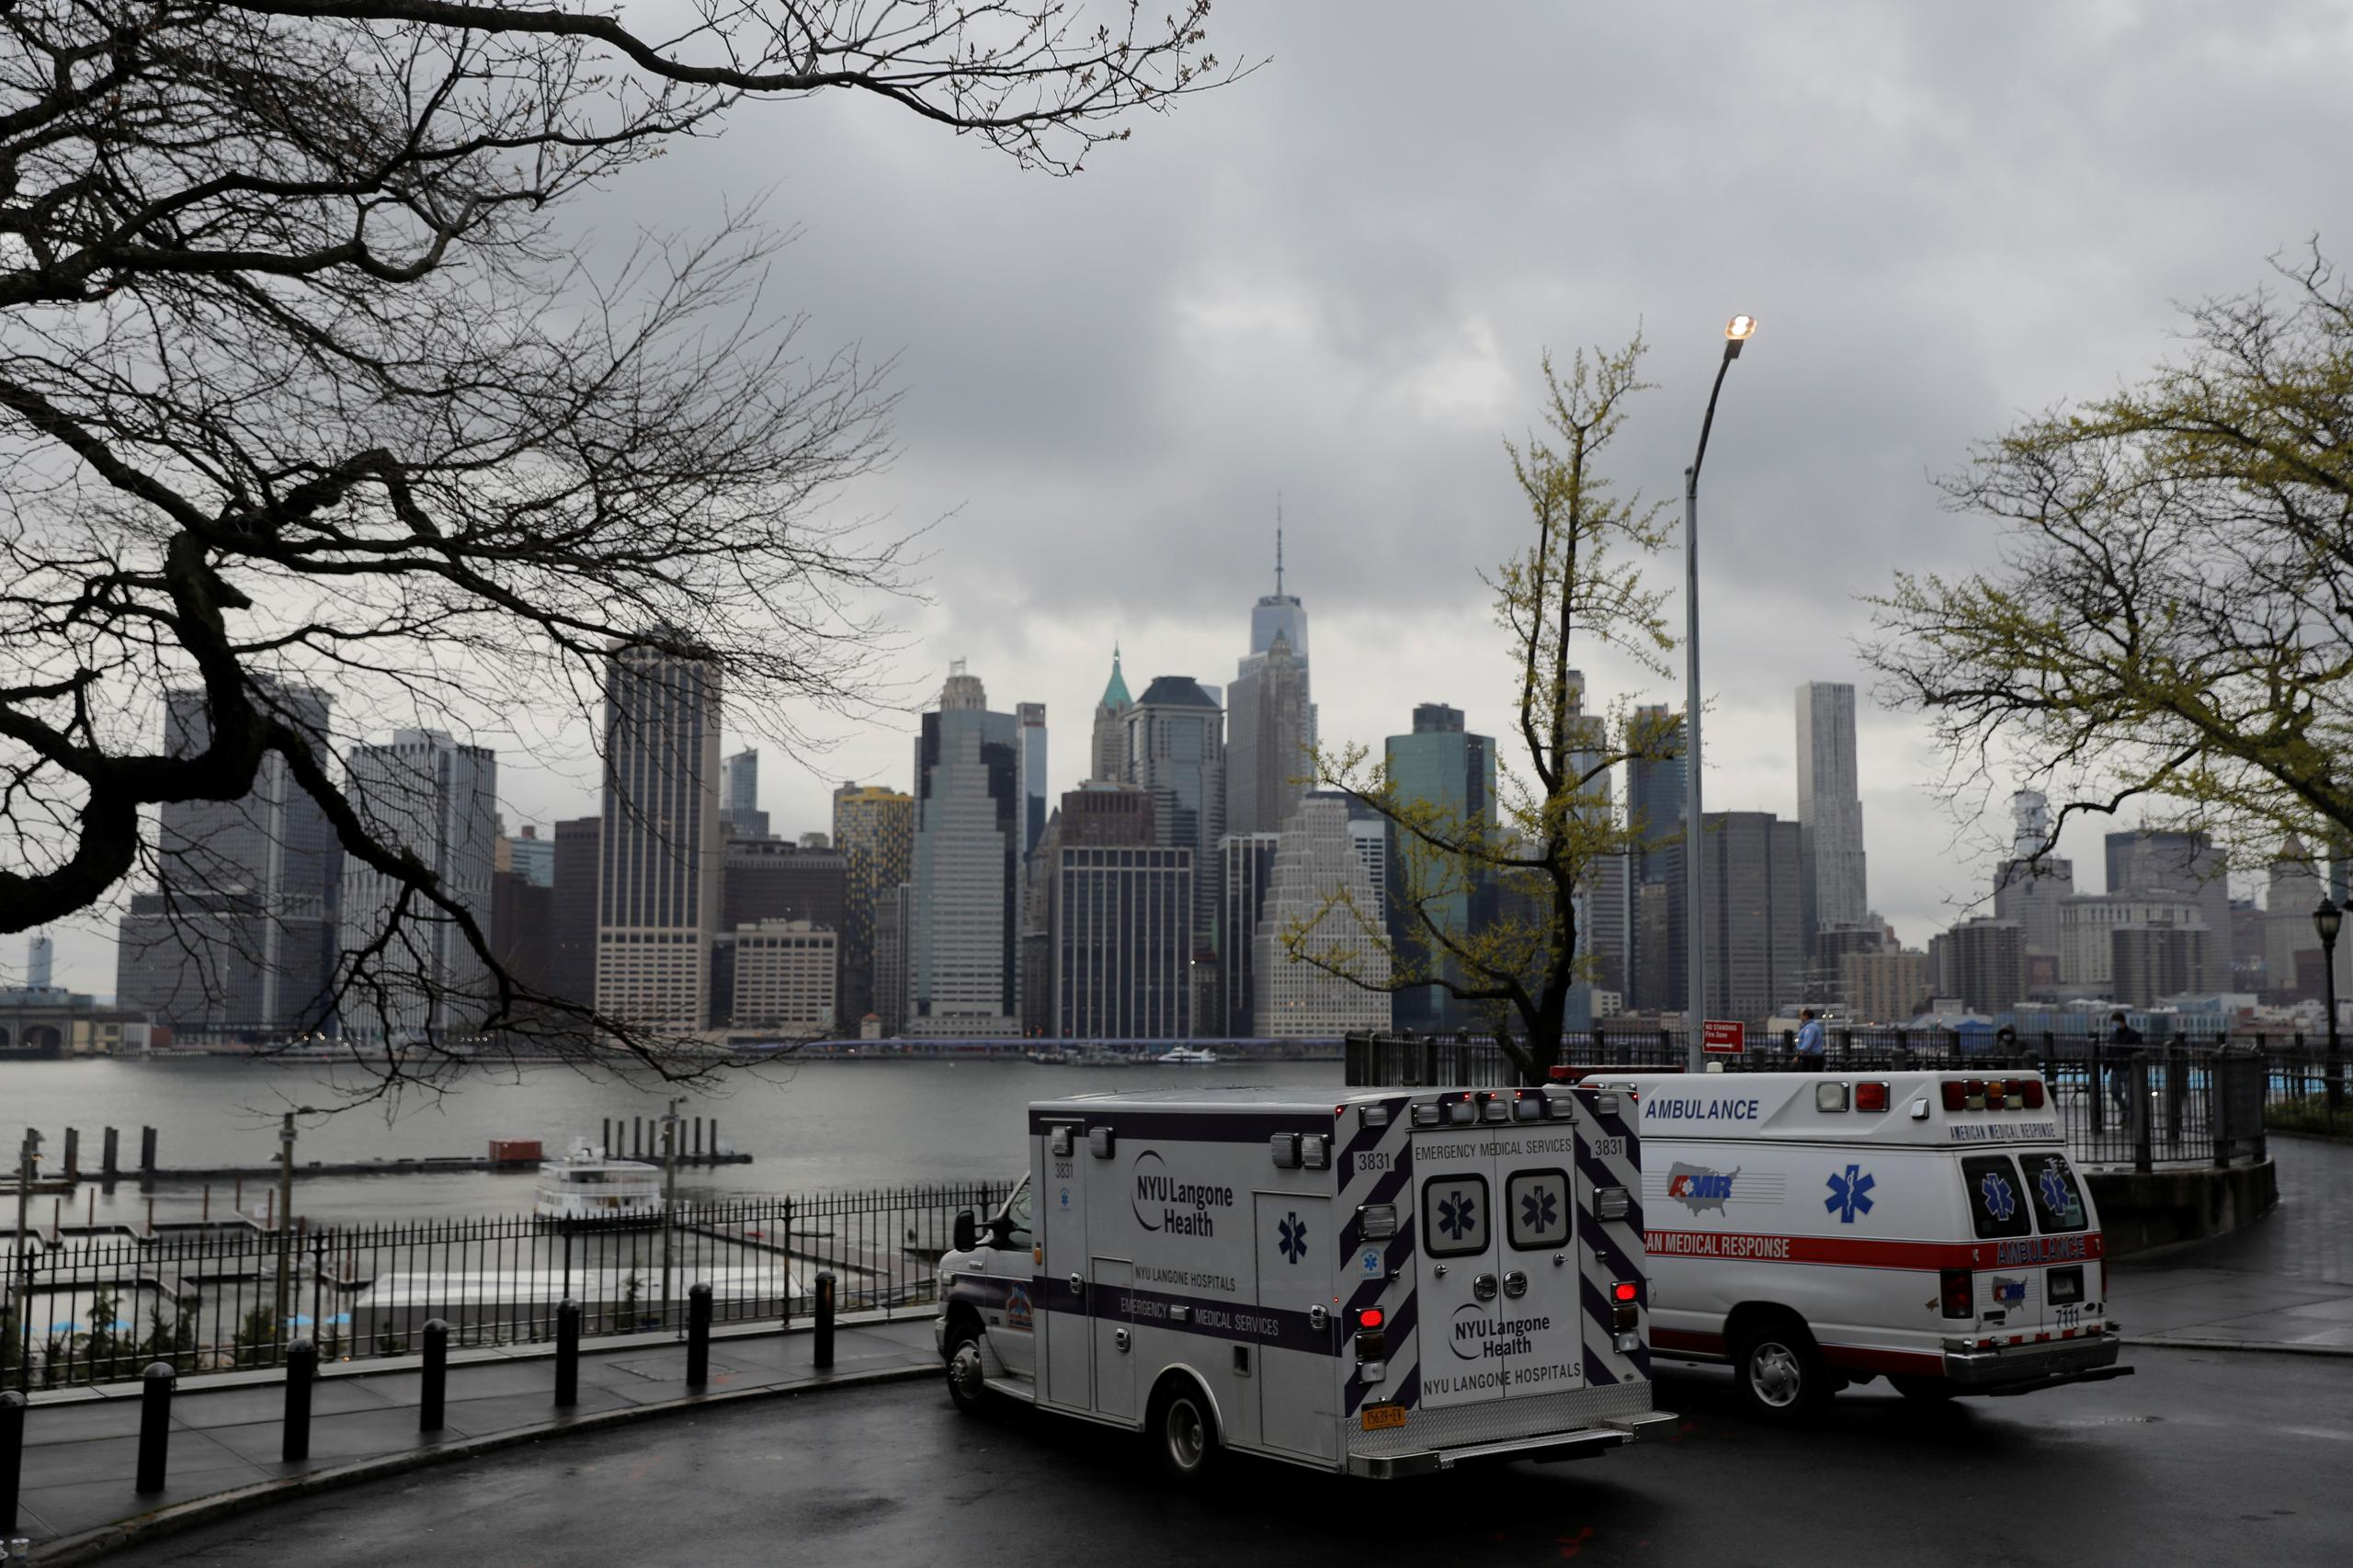 Coronavirus came to New York from Europe, not China, governor says